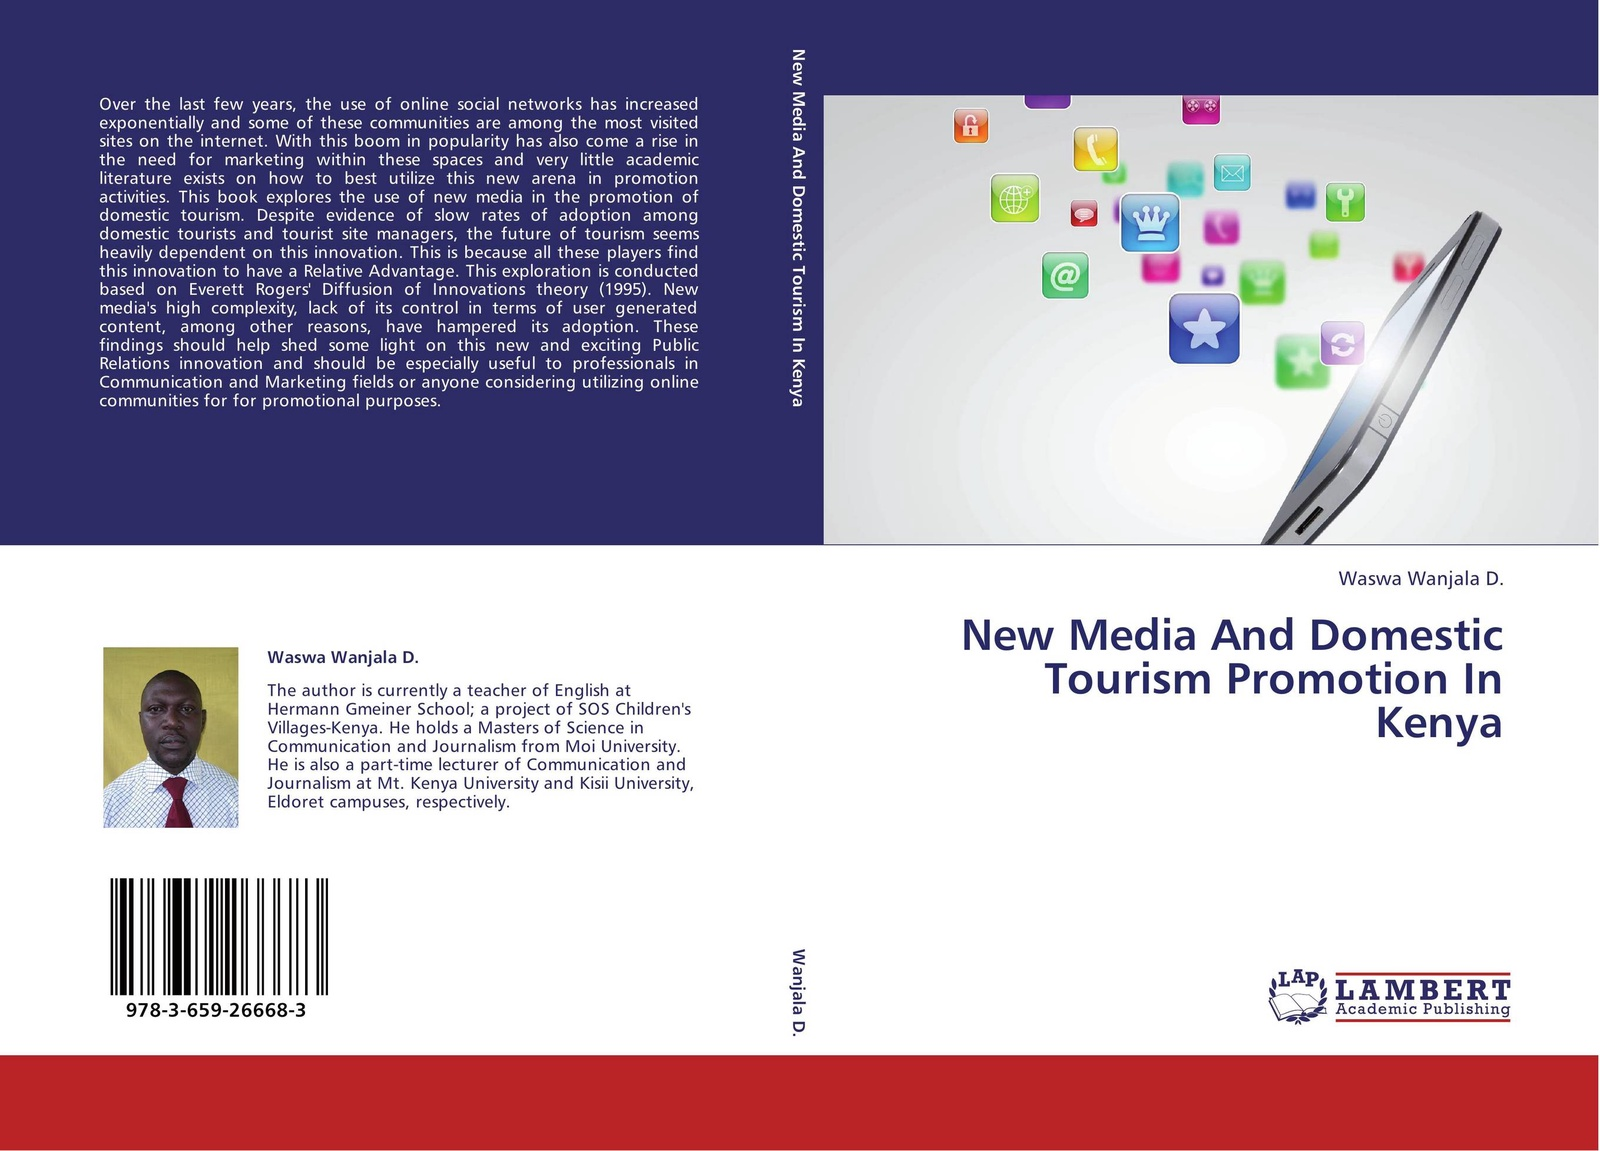 Waswa Wanjala D. New Media And Domestic Tourism Promotion In Kenya media promotion